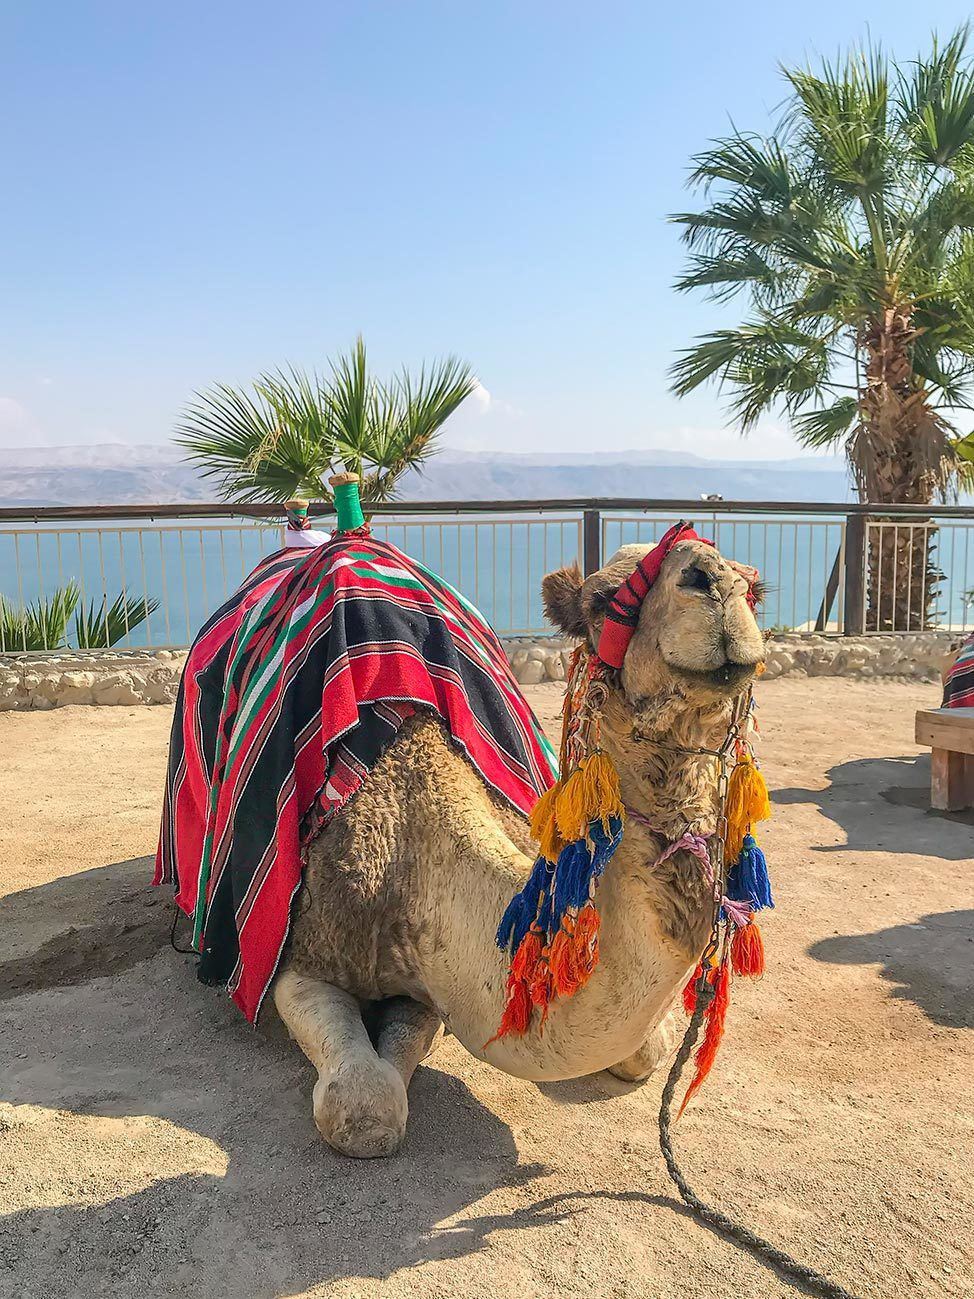 Camel at Kalia Beach, Dead Sea